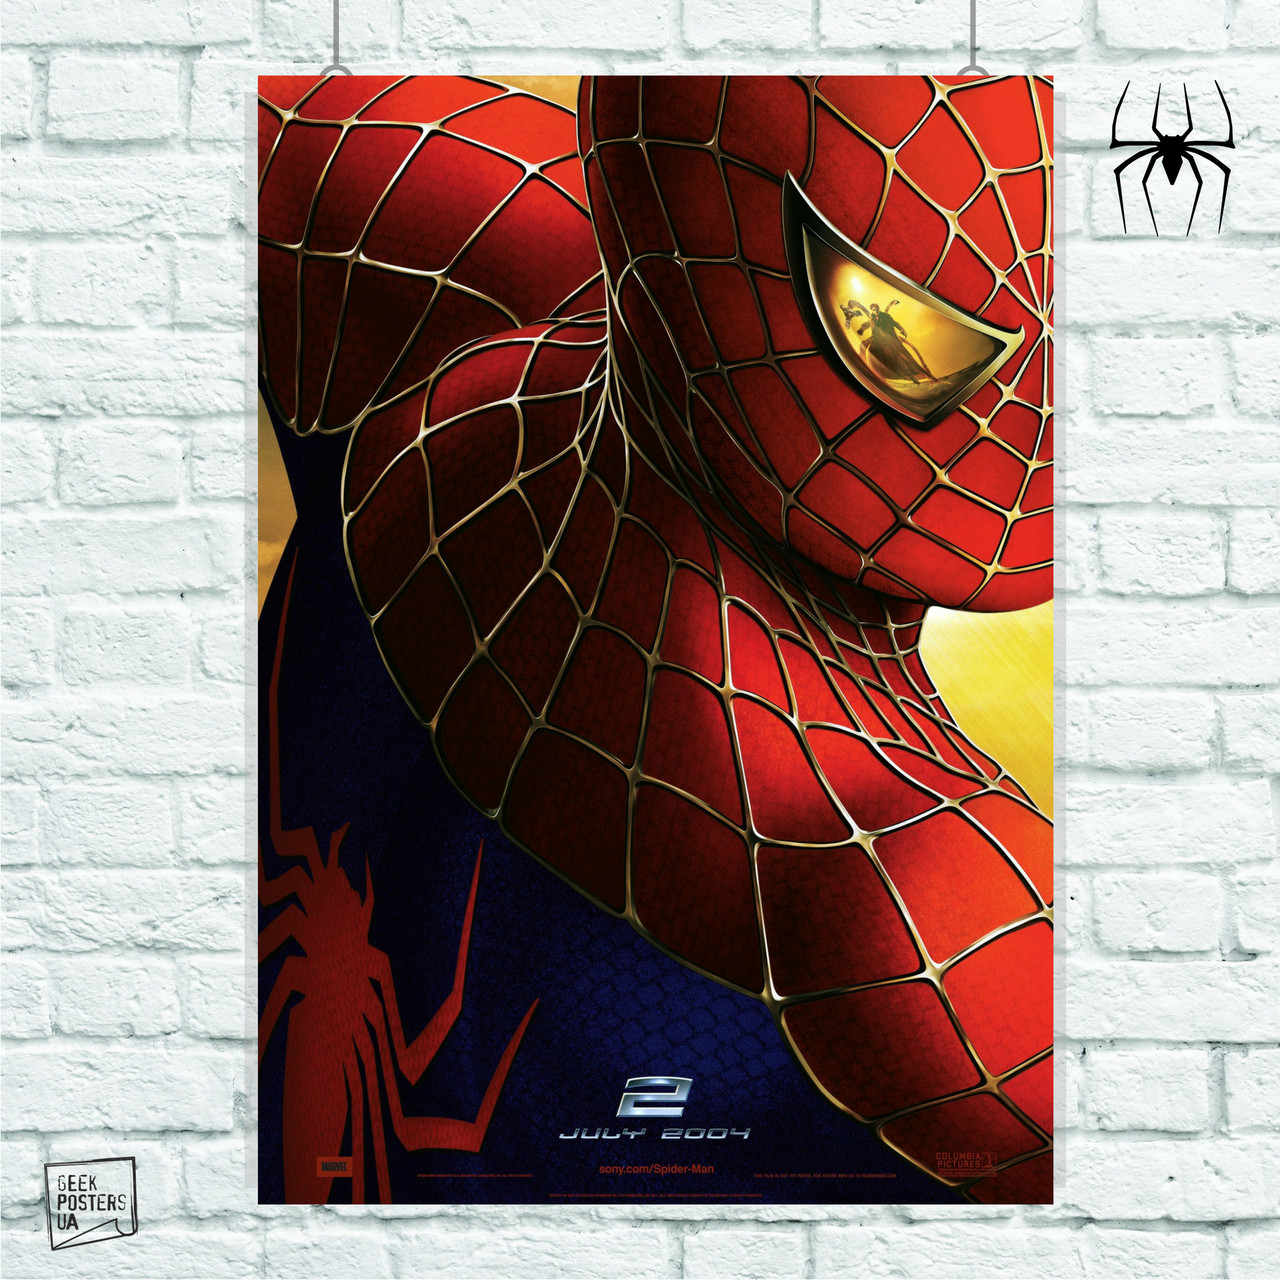 Постер Spider-Man 2, Человек-паук, Спайдермен. Размер 60x42см (A2). Глянцевая бумага